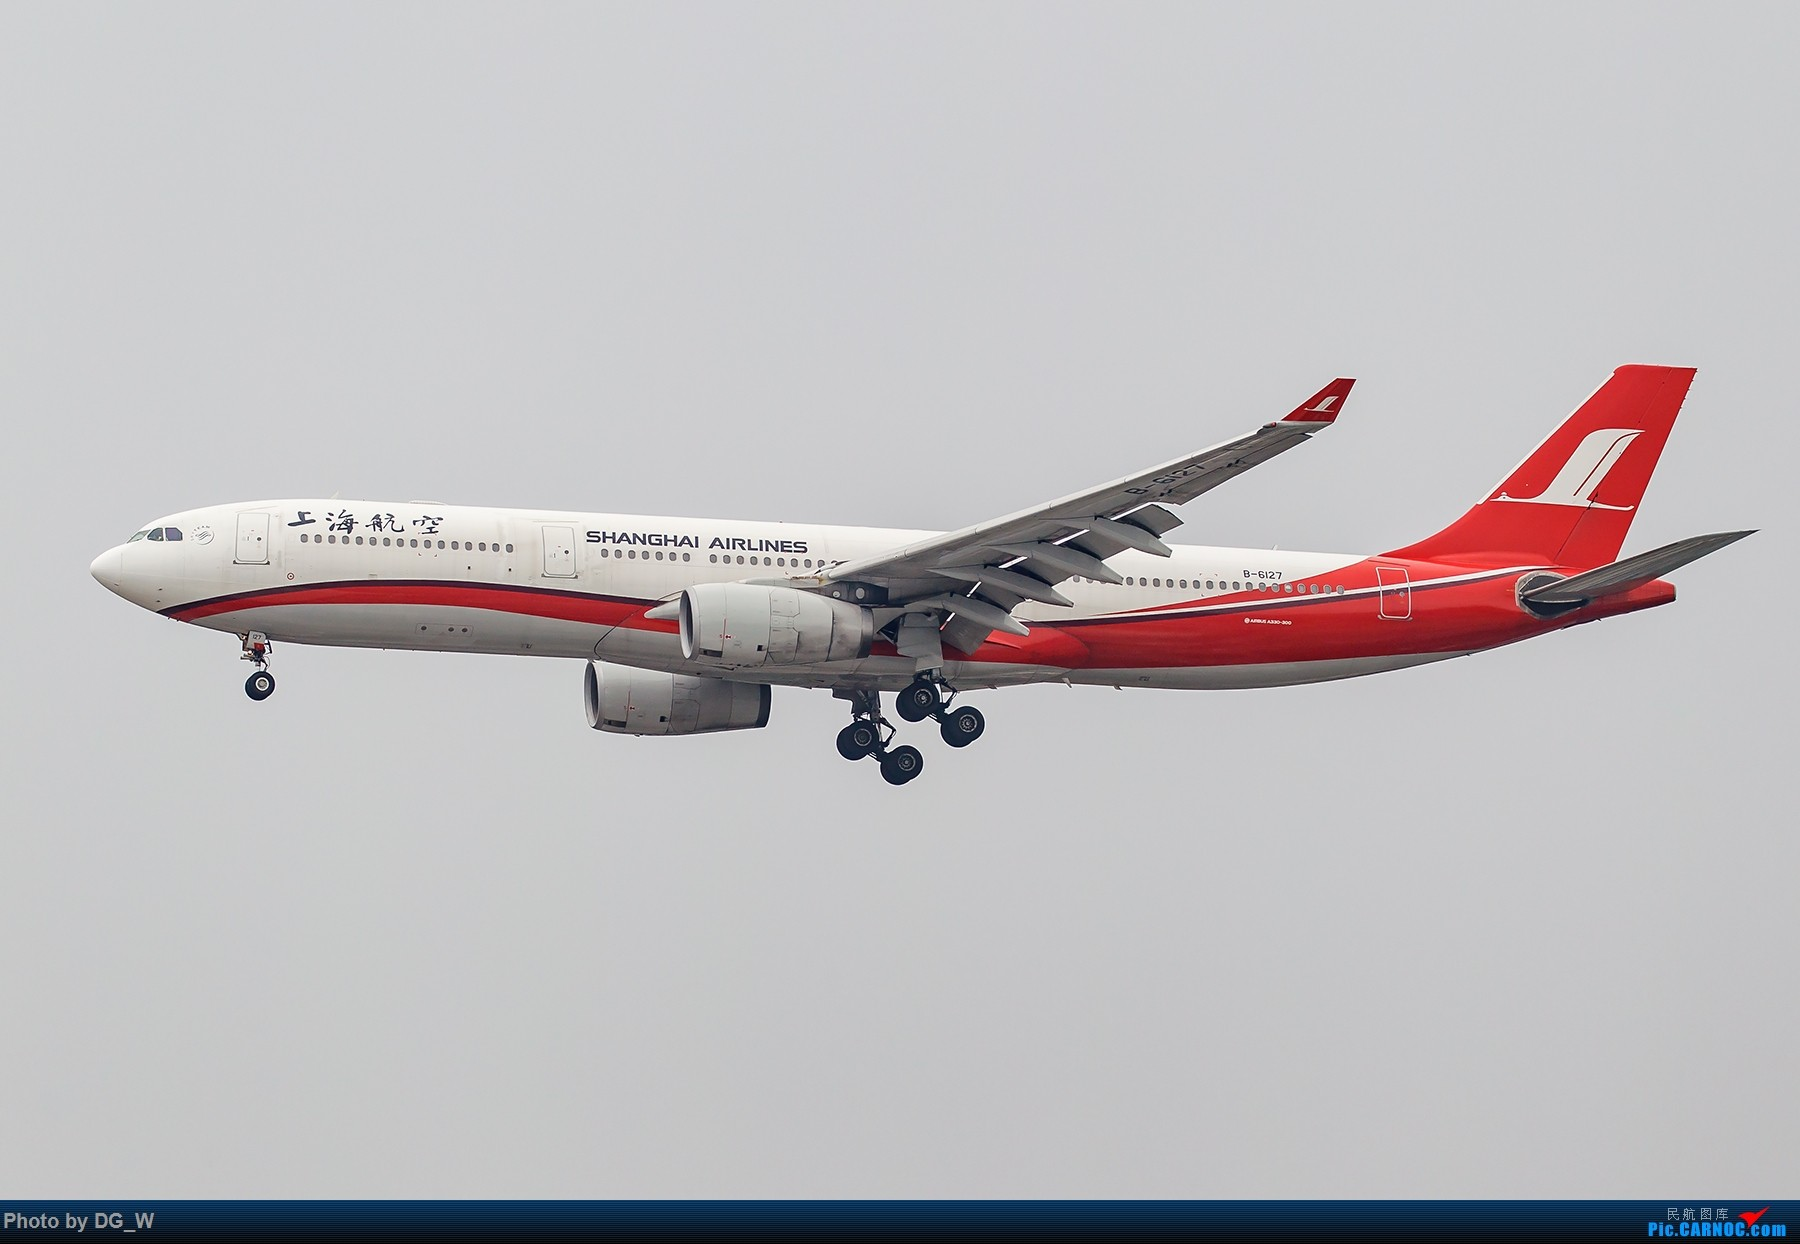 Re:[原创]【南宁飞友】两月之内三次虹桥拍机,大雨中的吹水,水泥天的迪斯尼,晚点的789,不期而遇的ARJ AIRBUS A330-300 B-6127 中国上海虹桥国际机场